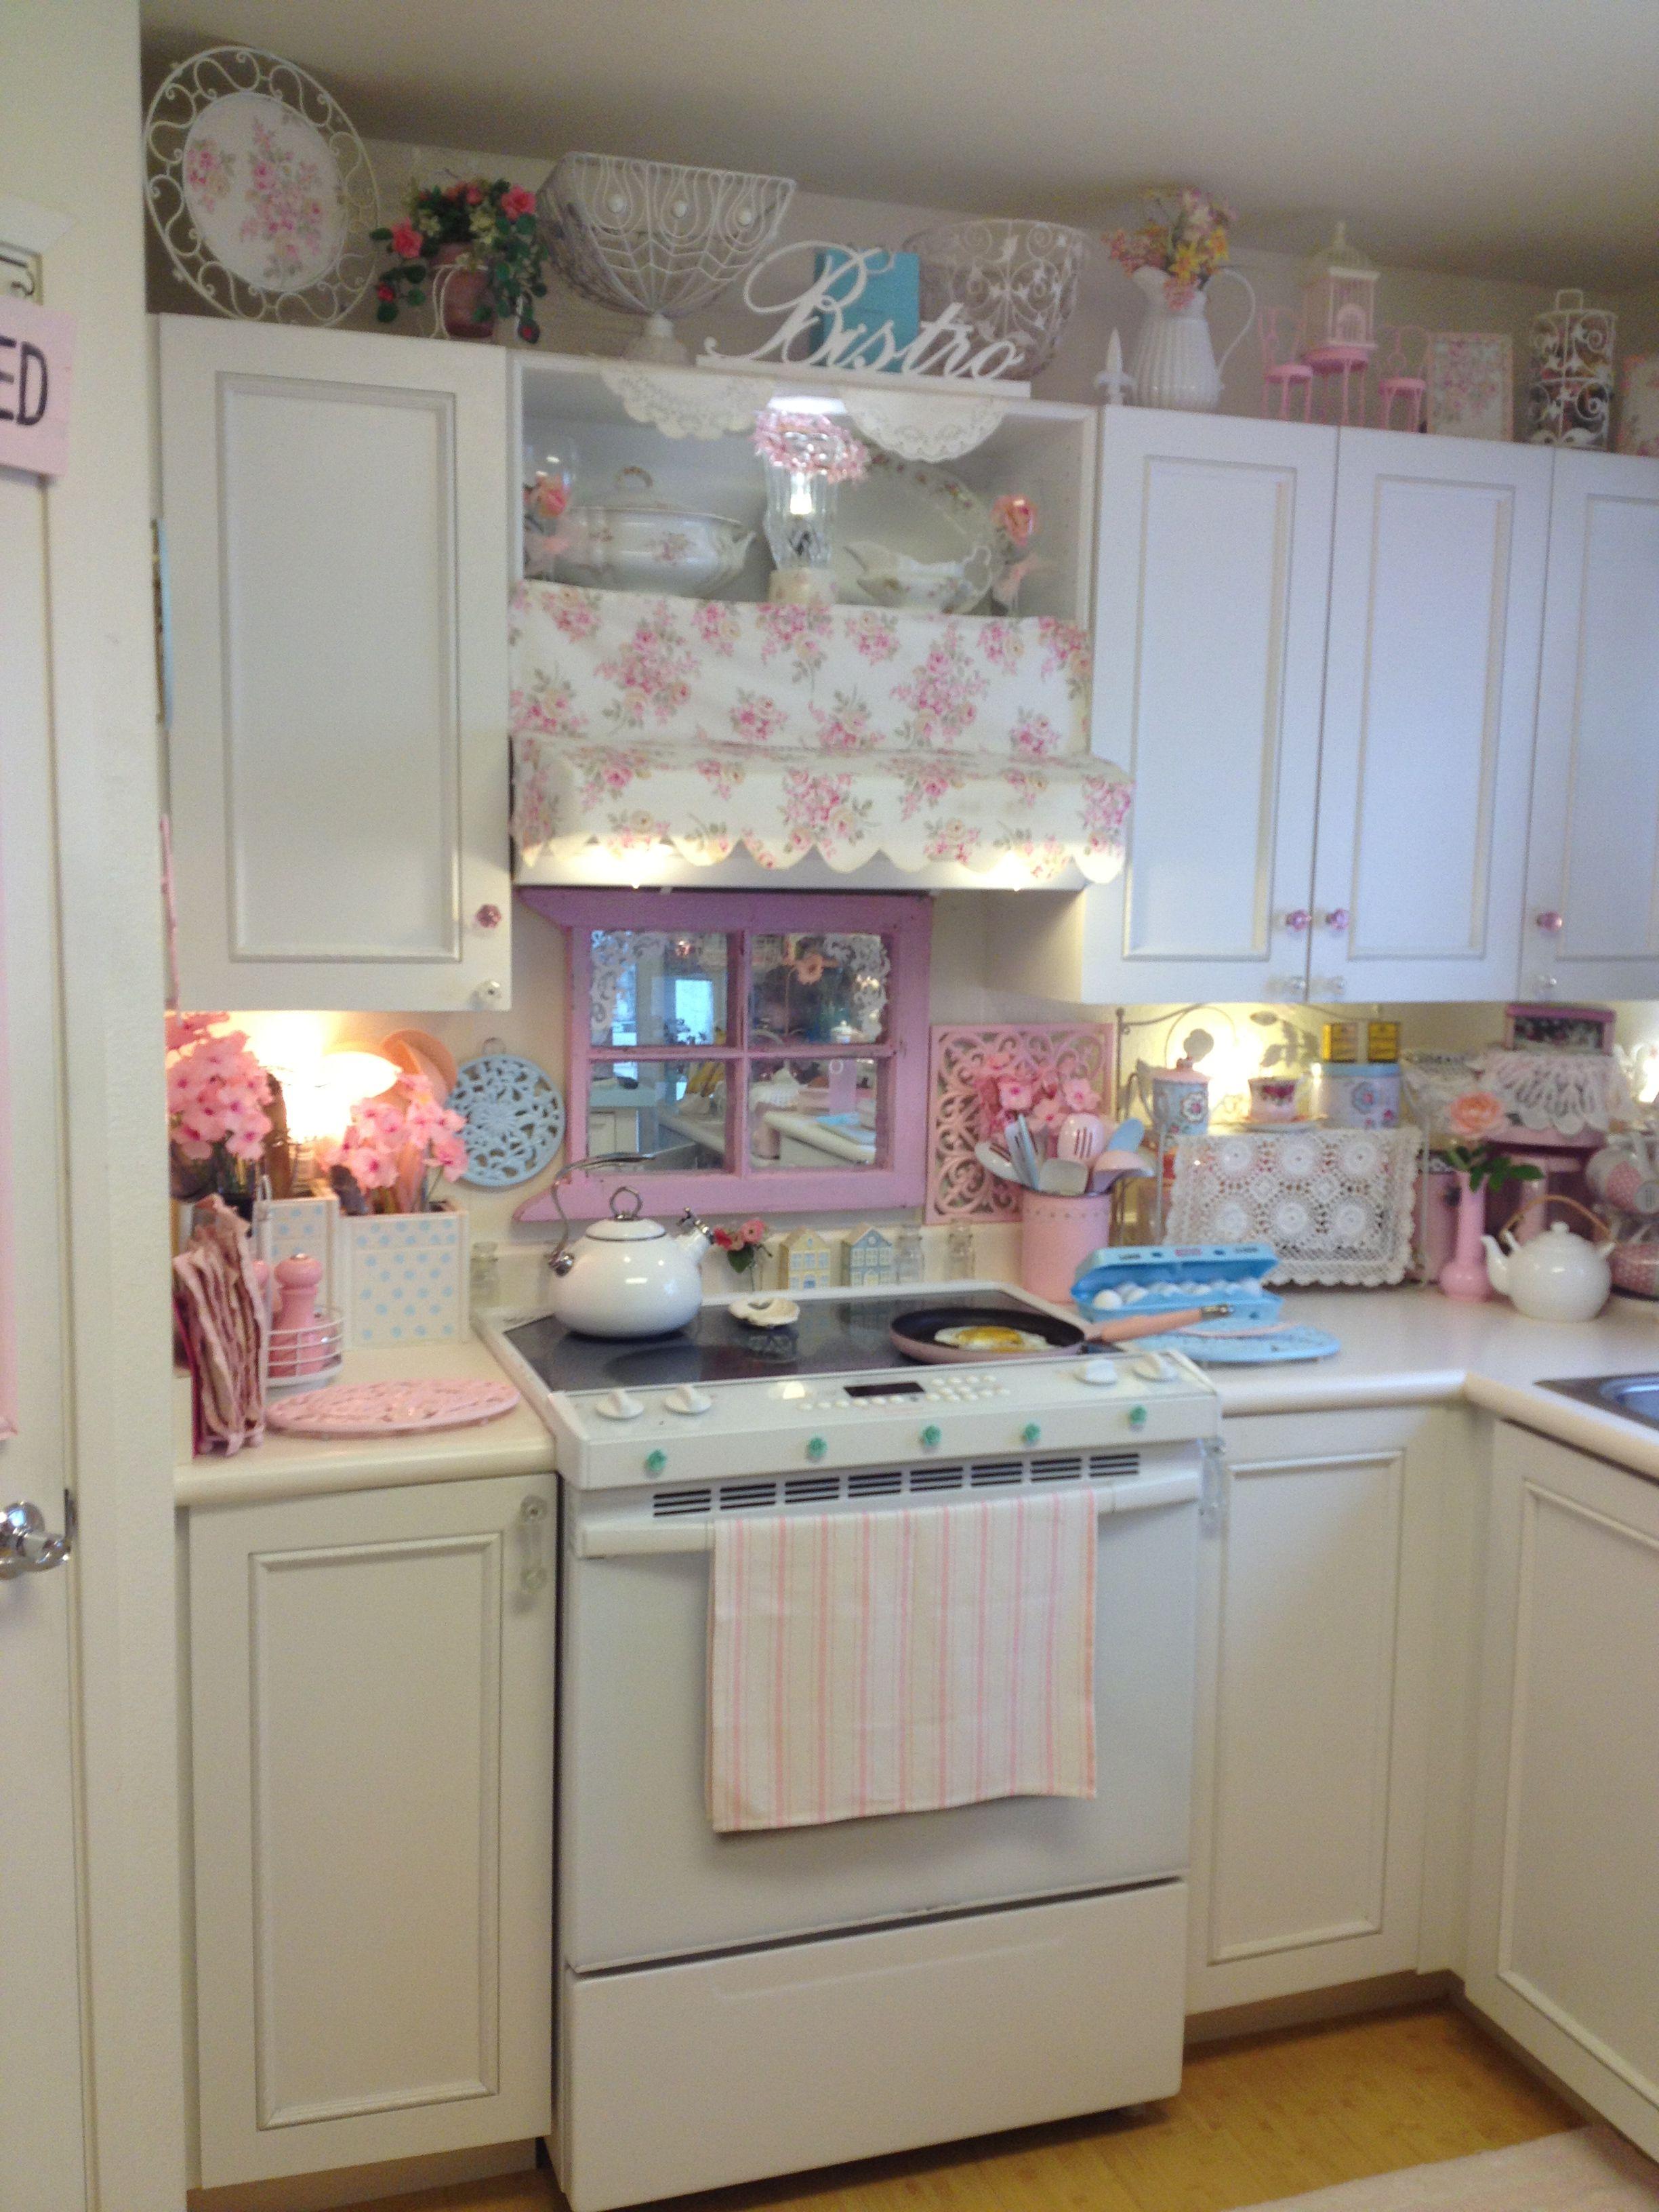 pink and blue kitchen pink and blue kitchens pinterest pink and blue kitchen romantic kitchenshabby chic